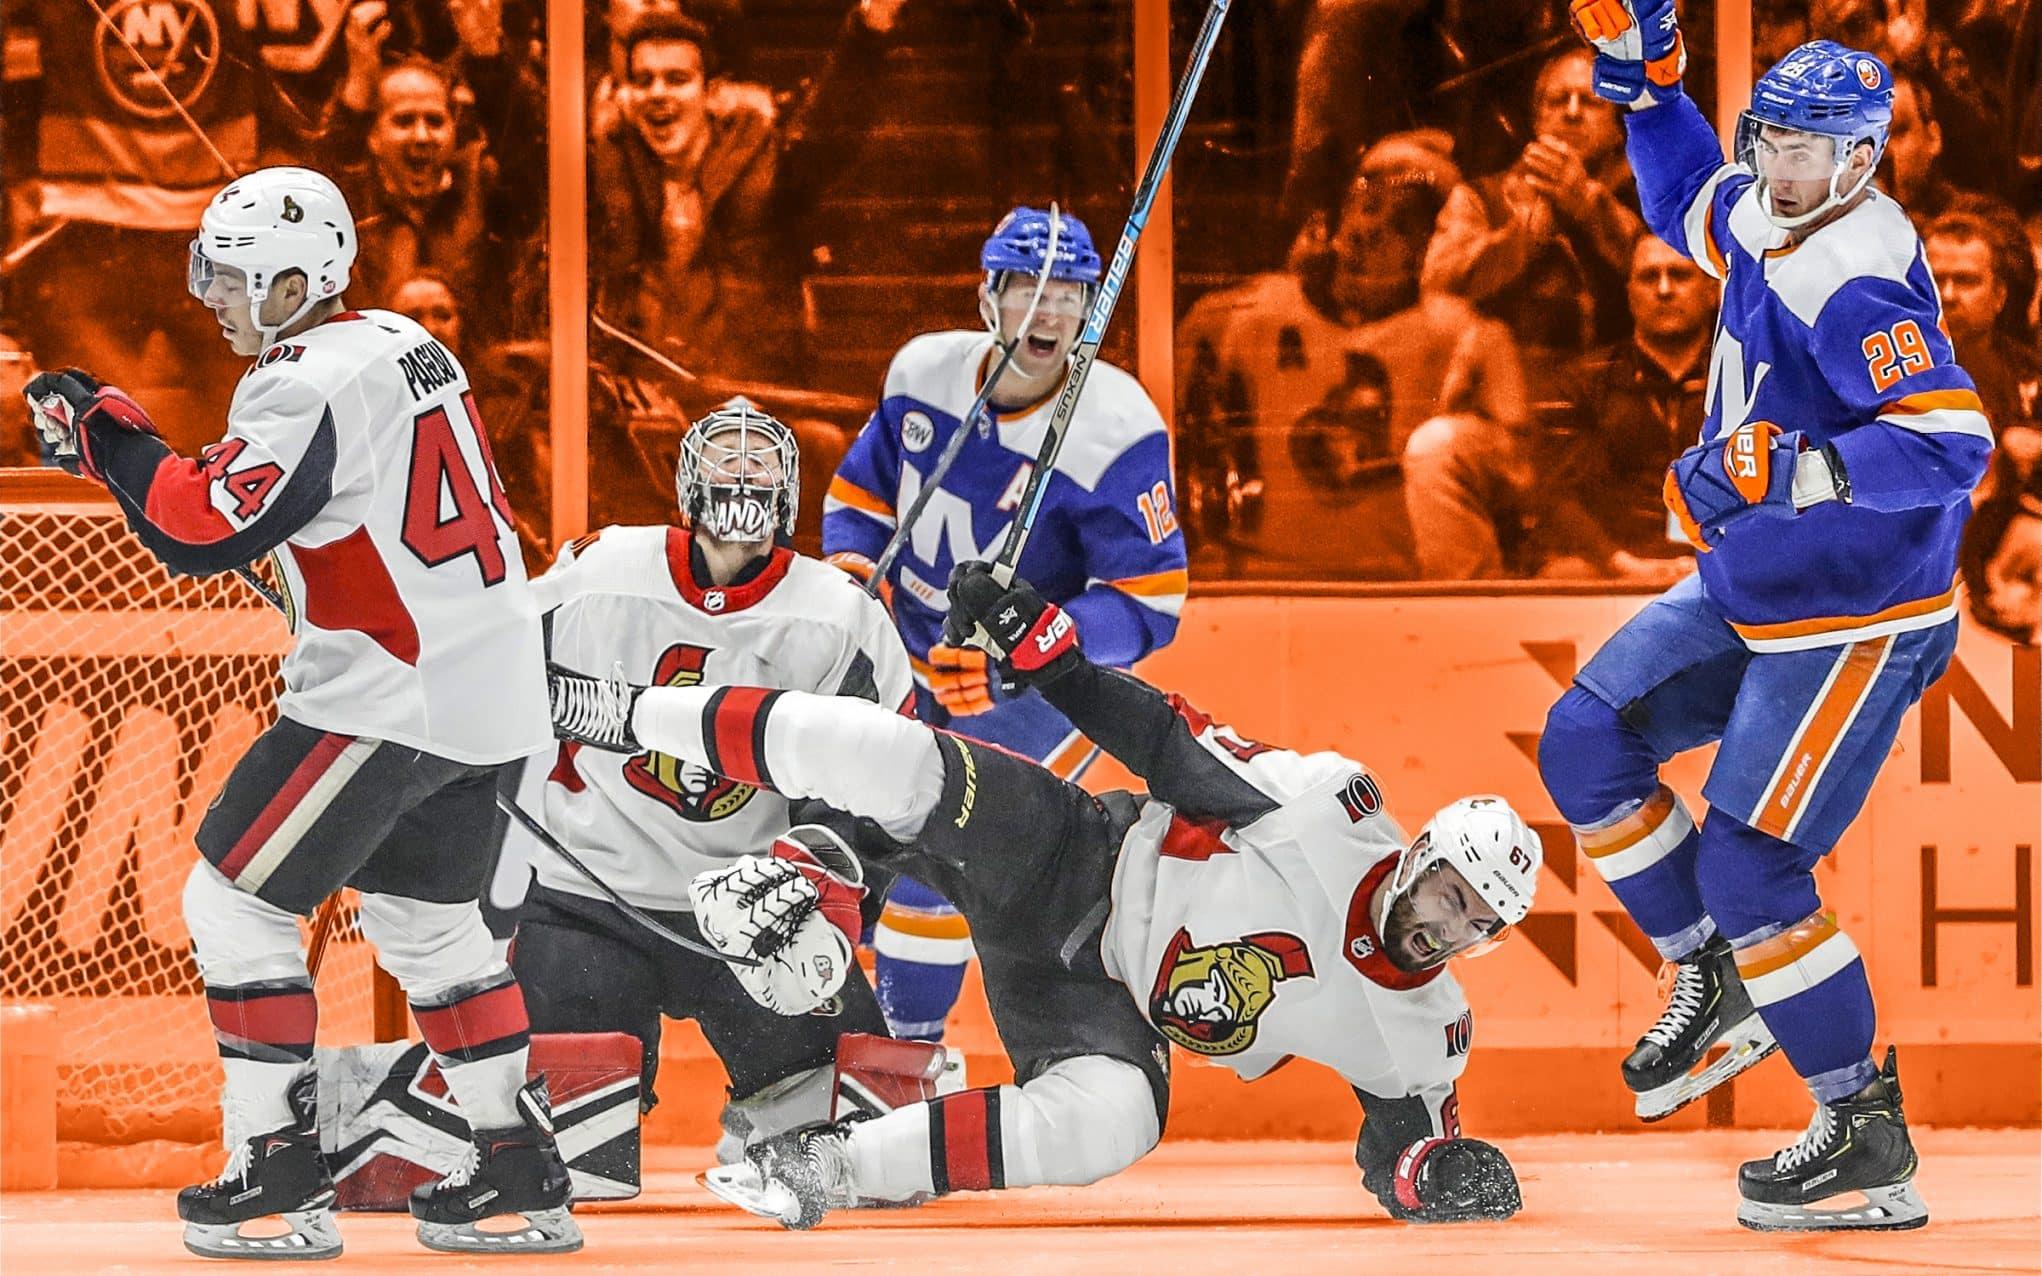 7ac1cbd94eb Valtteri Filppula nets pair in New York Islanders  frantic 4-2 win over  Senators (Highlights)